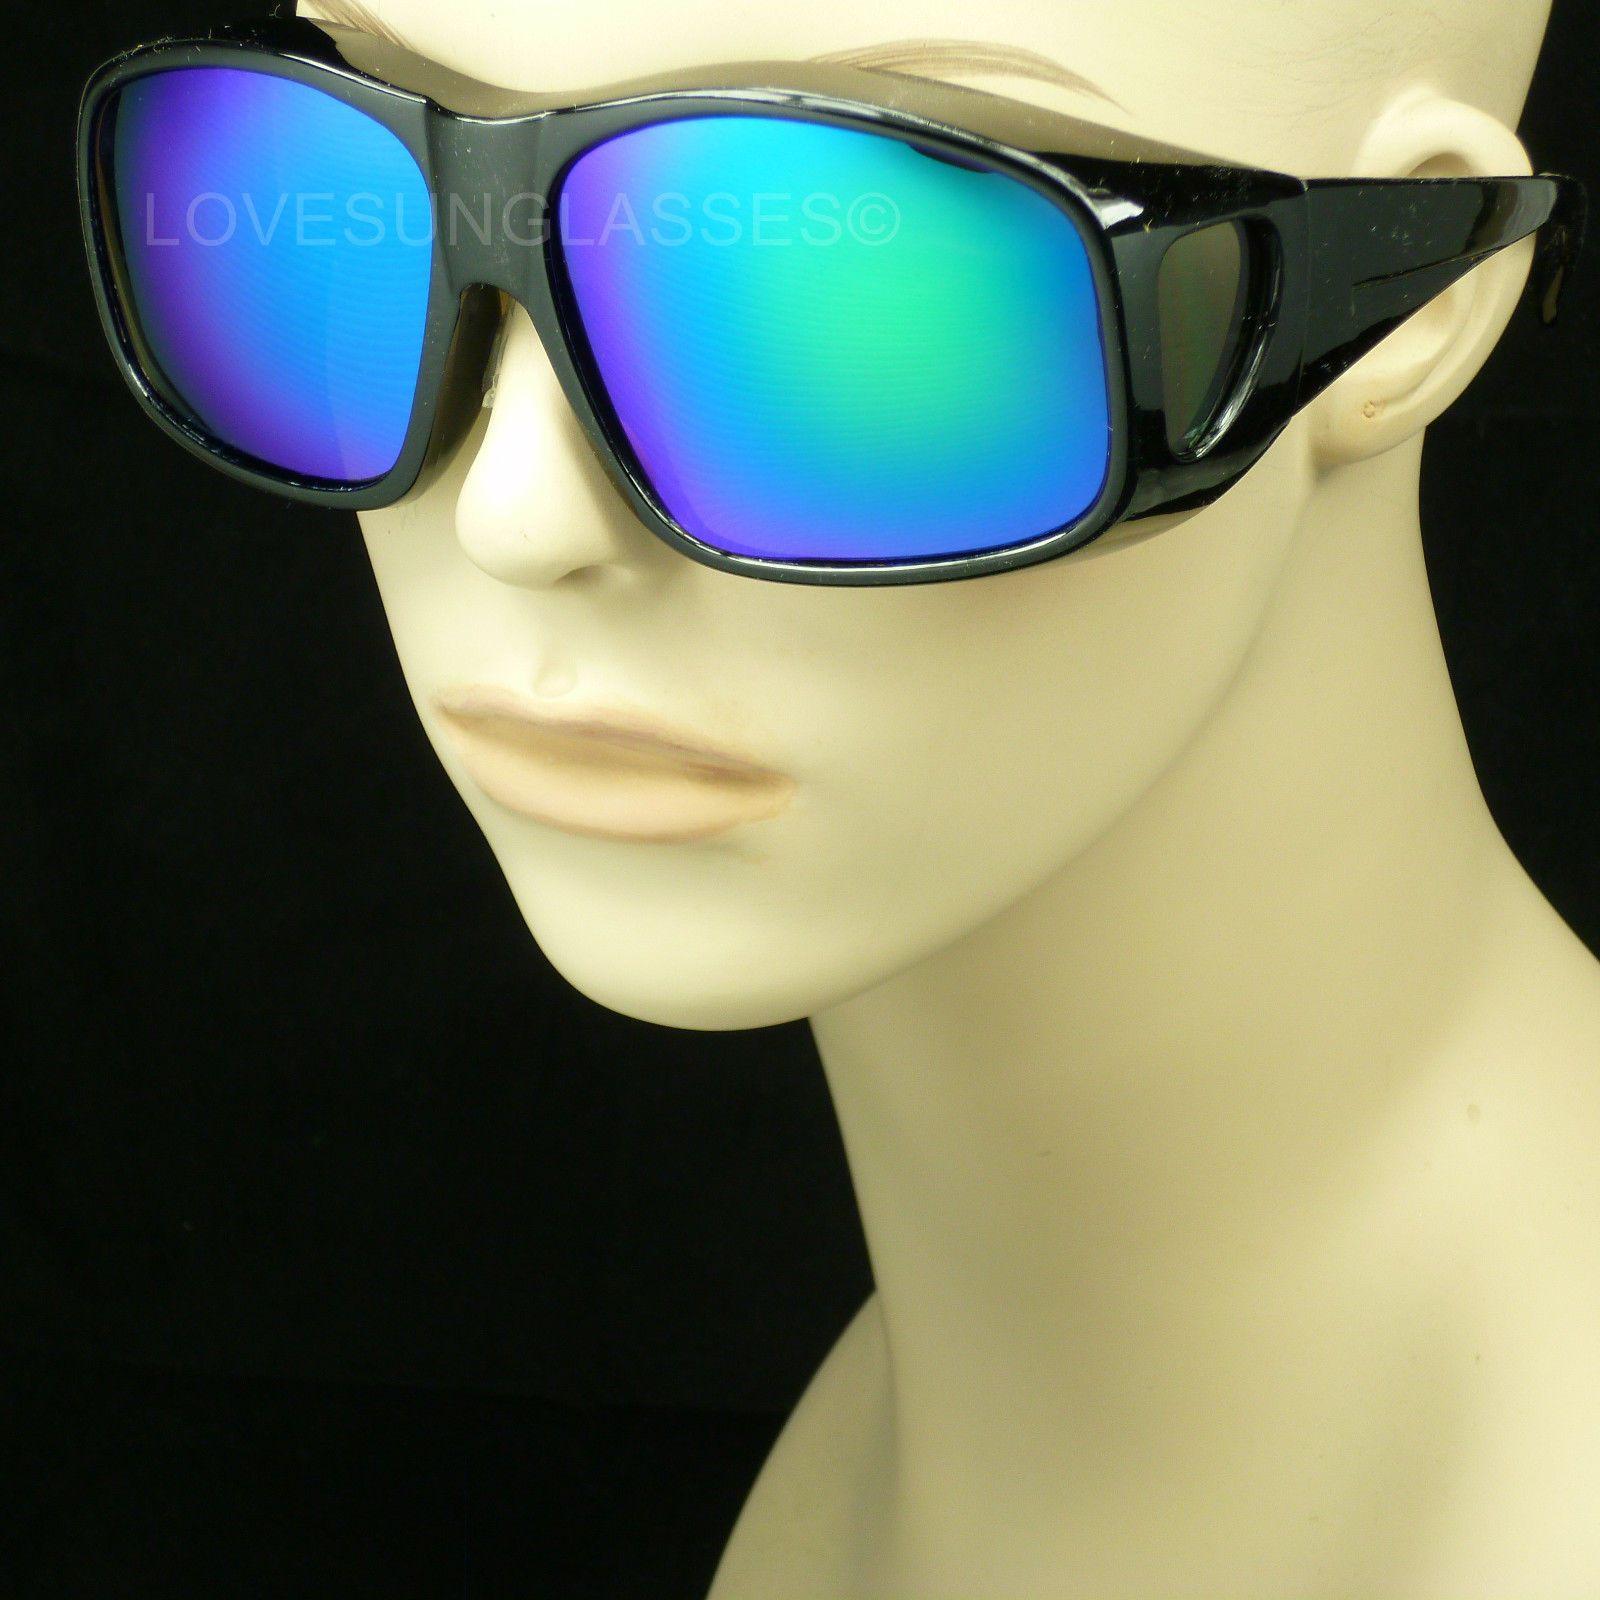 b520f5c7ccd Vistana MS Polare Lens Over The Glasses Steel Copper